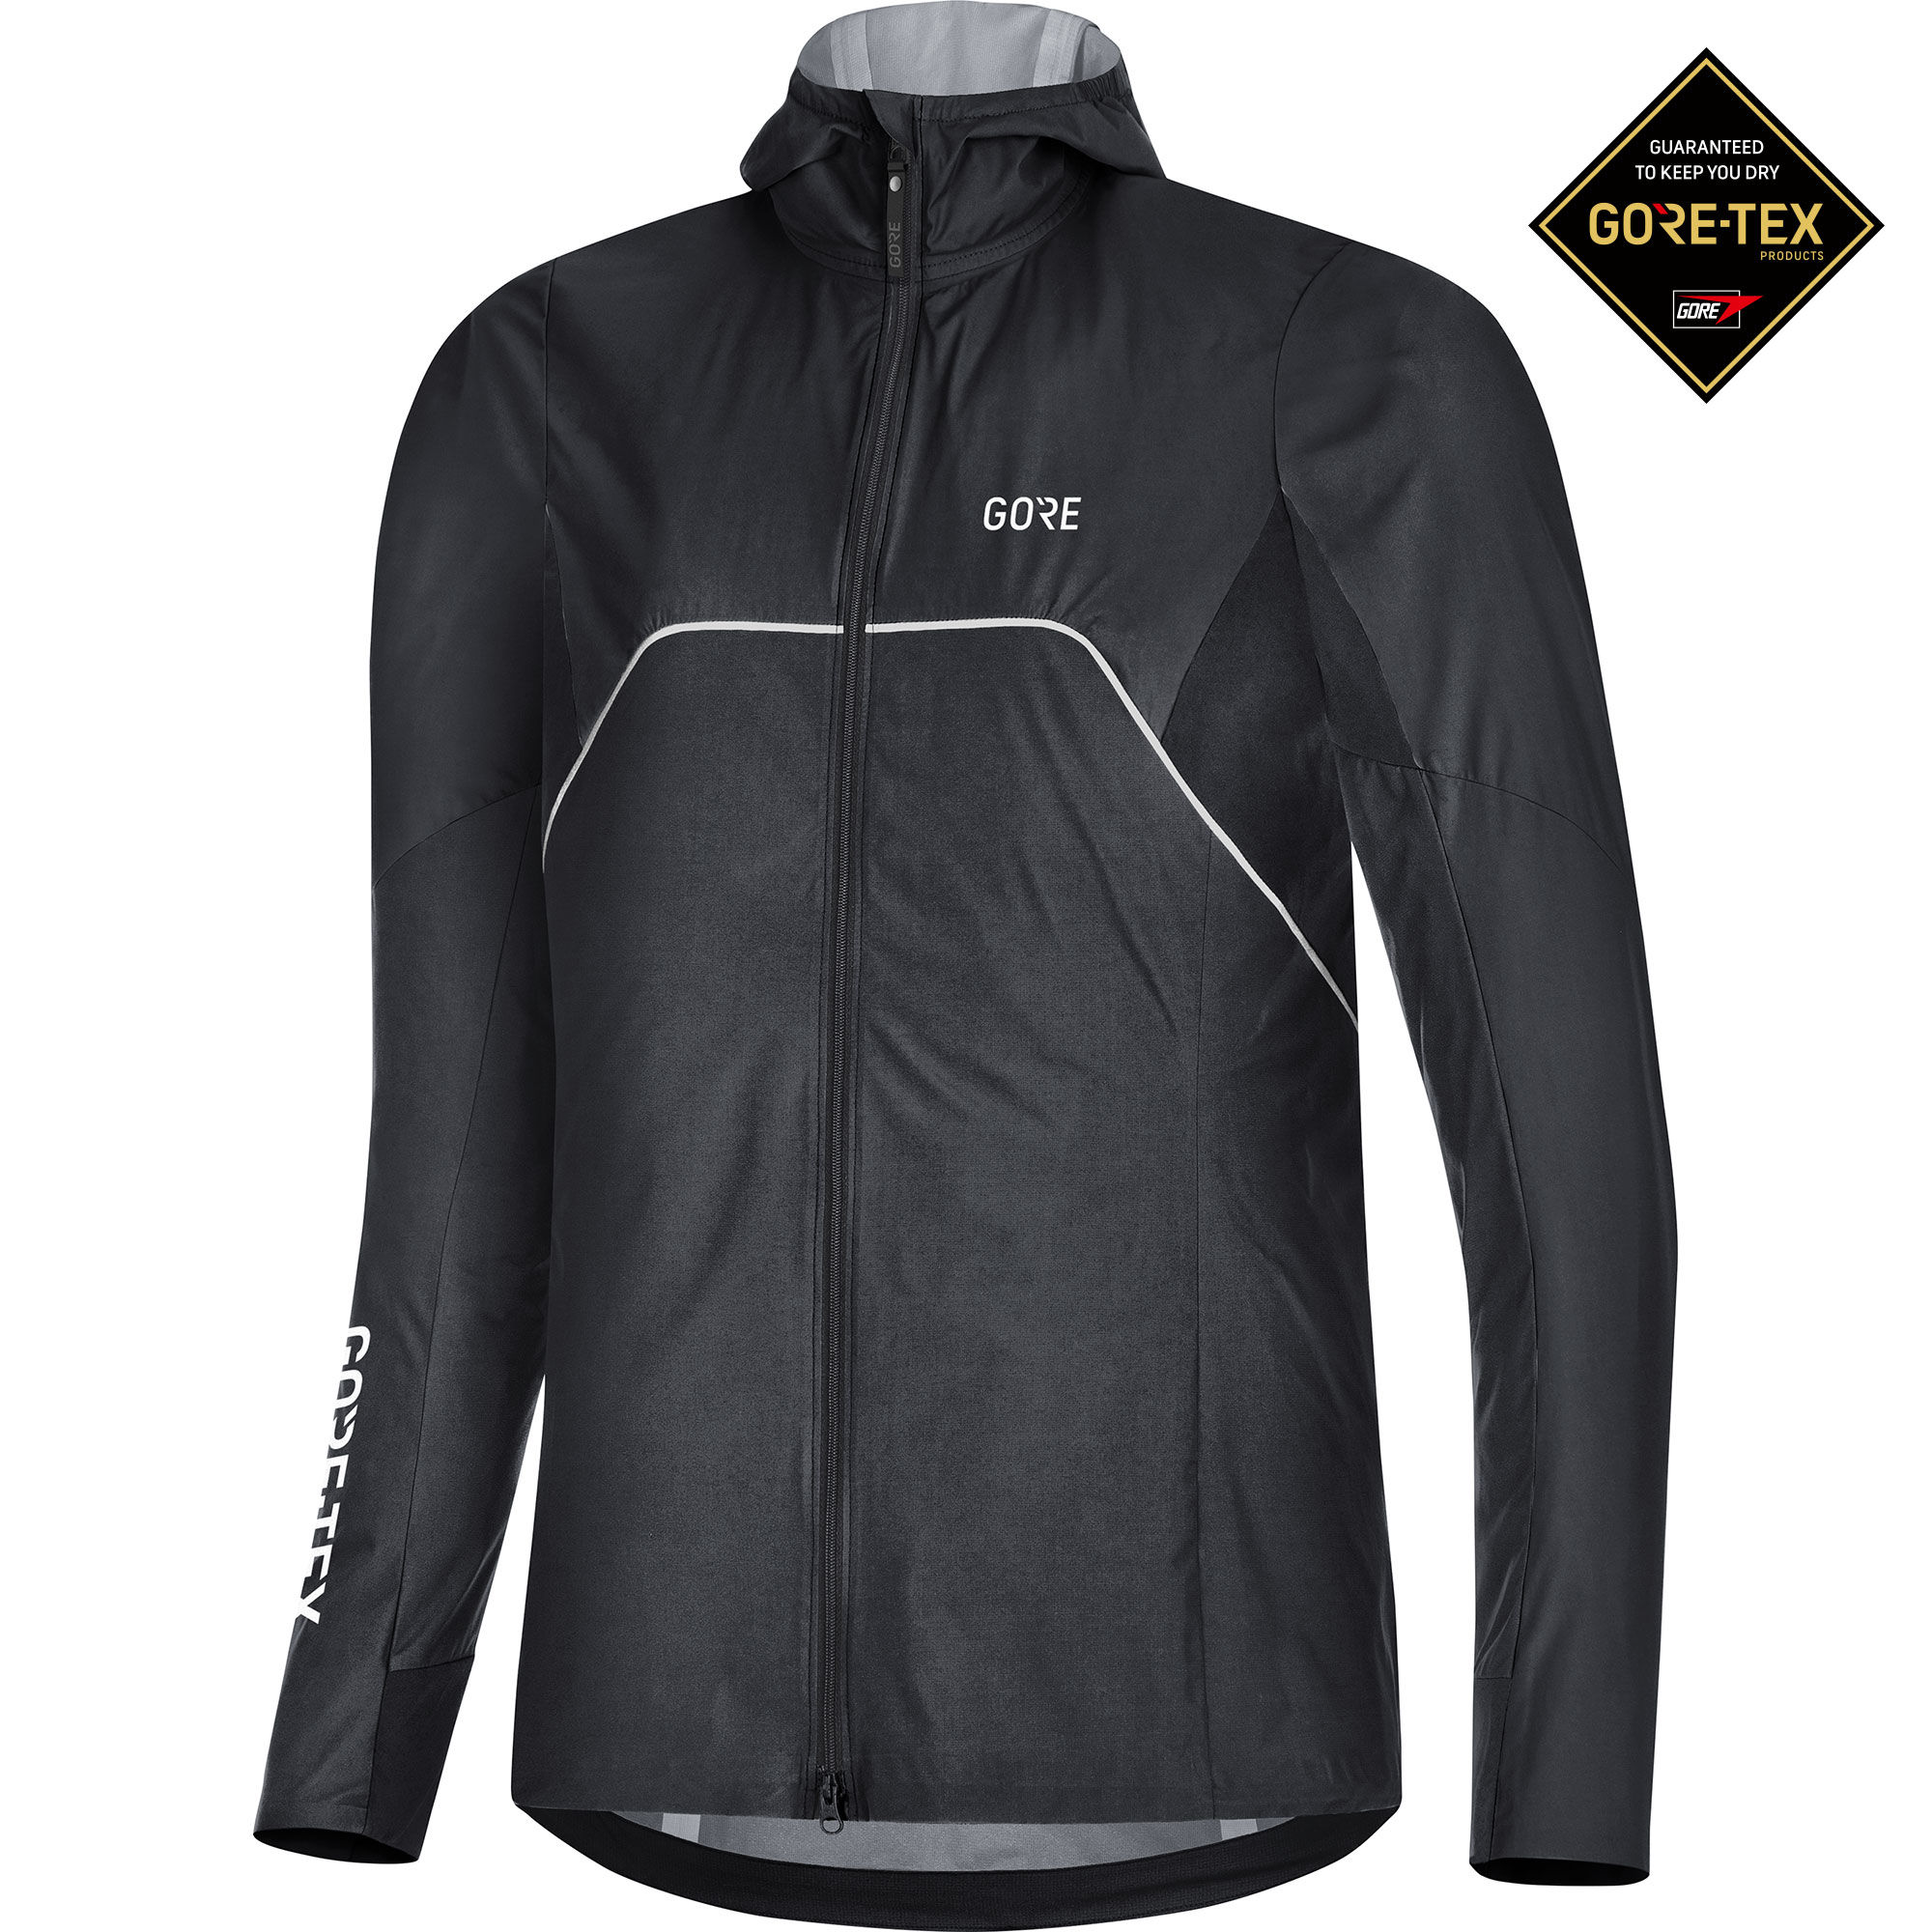 Gore Lady R7 GTX Shakedry Trail Jacket (Black)